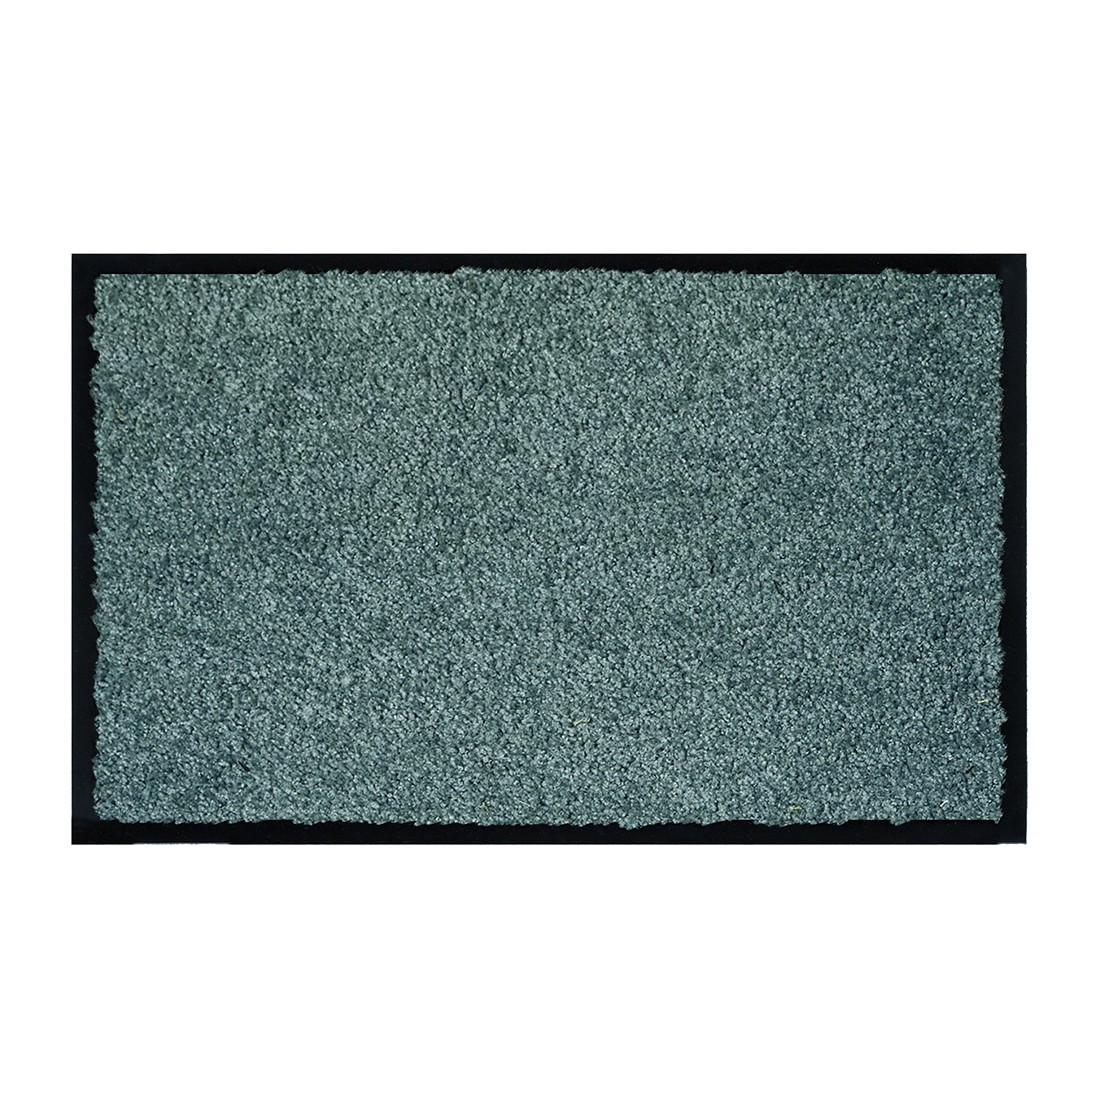 Fußmatte Proper Tex - Grau - 60 x 90 cm, Astra